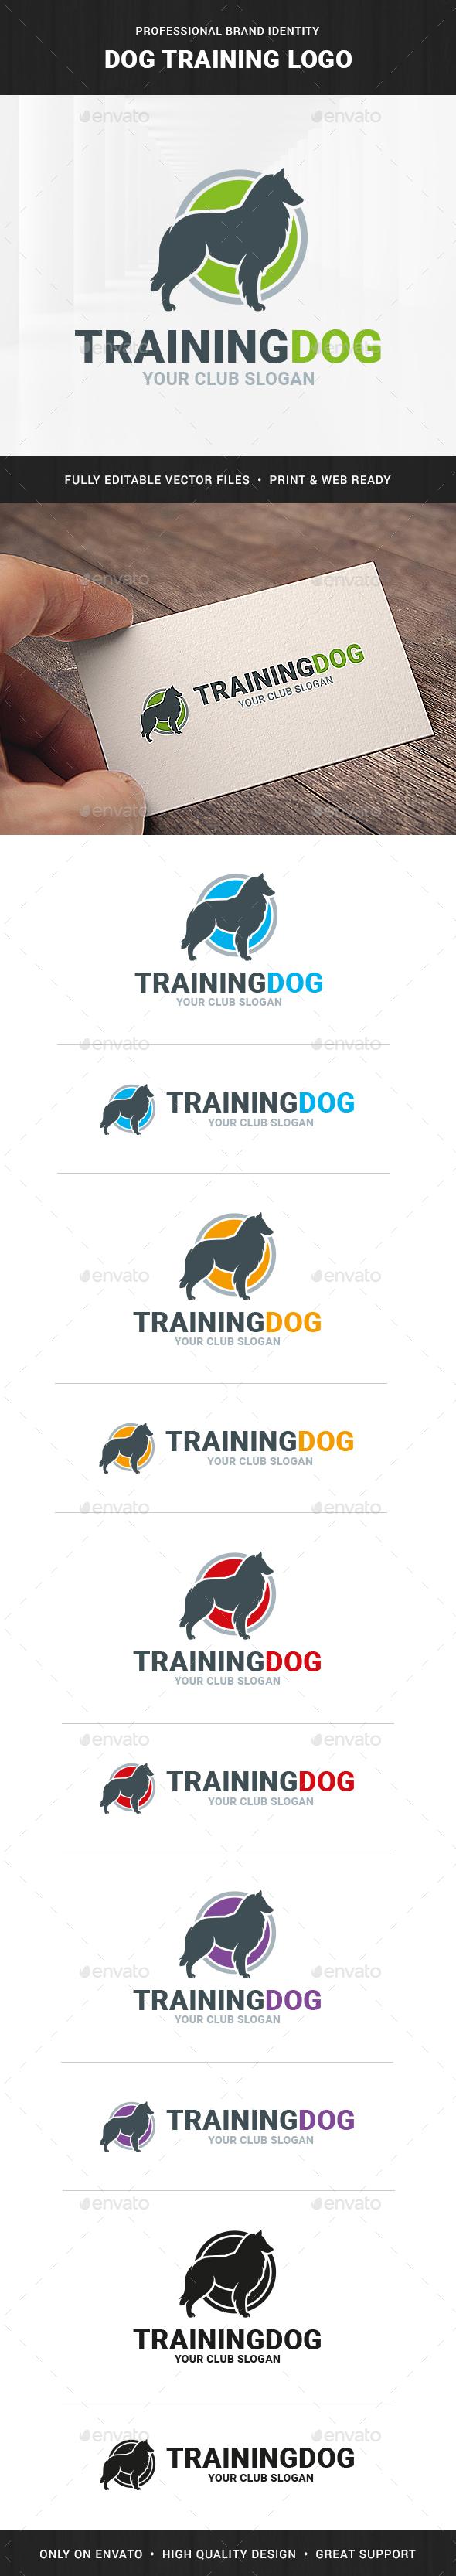 Dog Training Logo Template